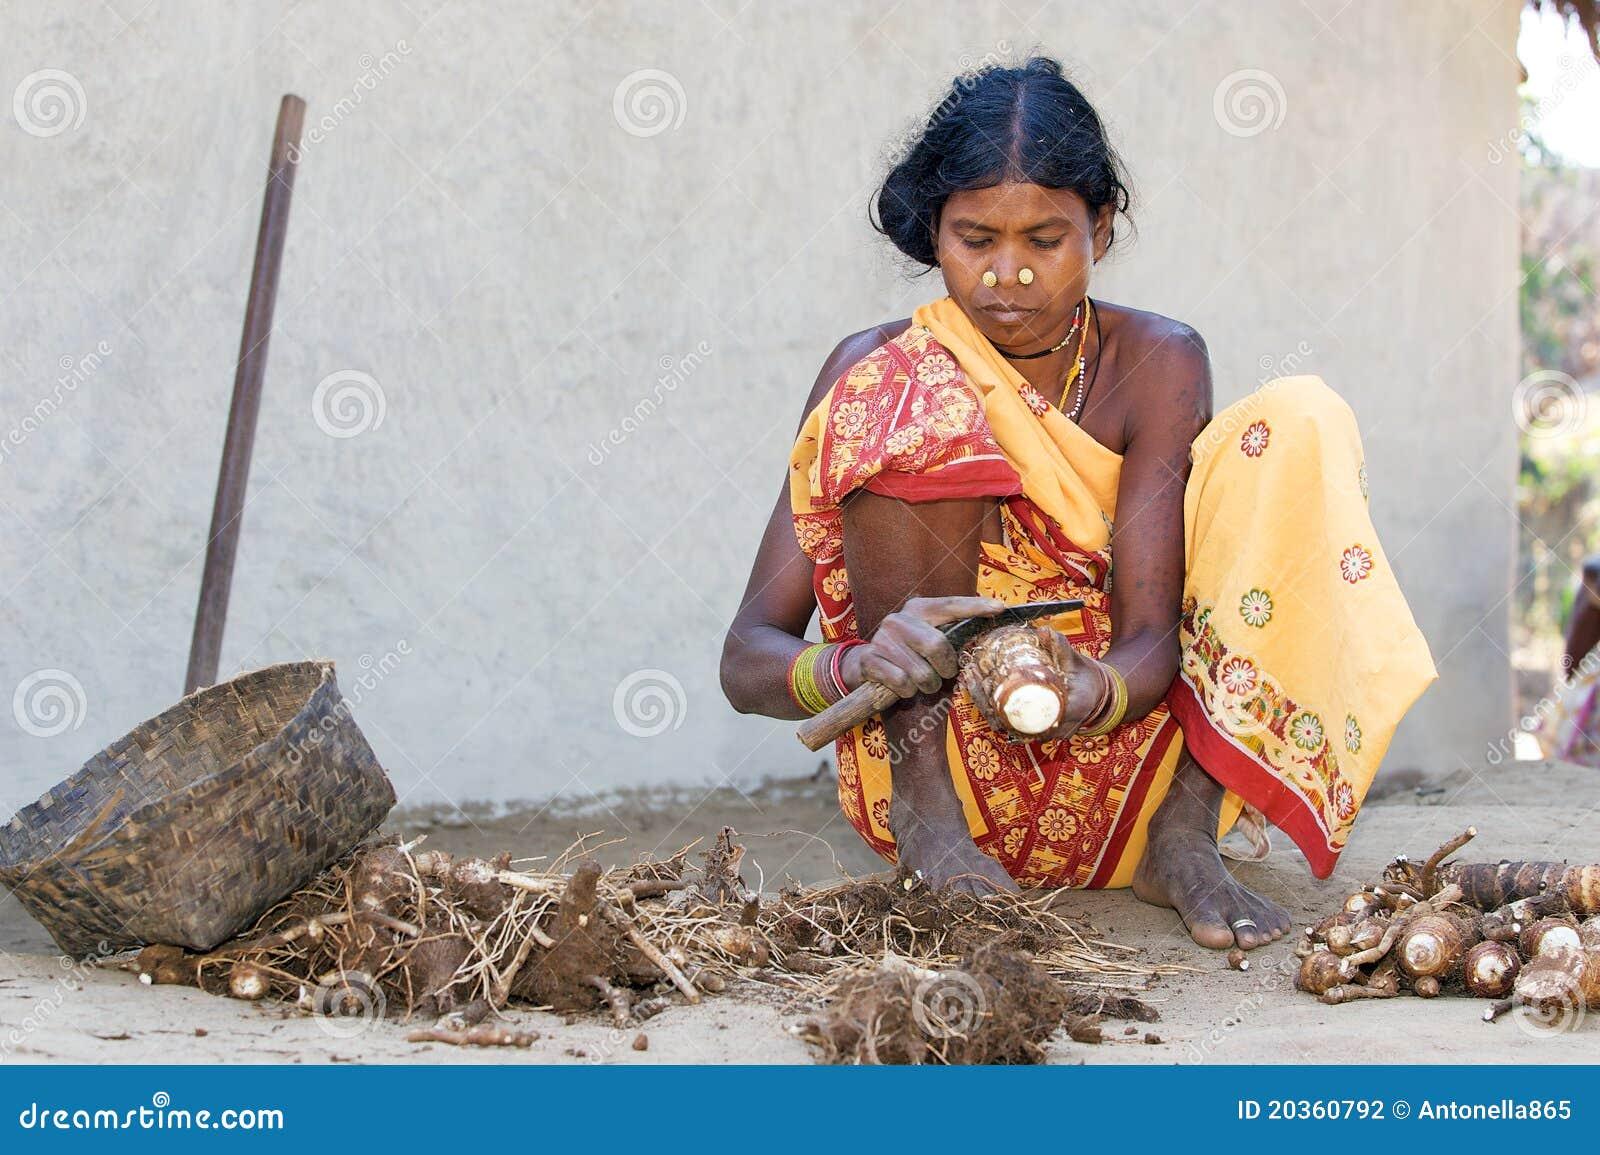 indian village women stock images - download 3,003 photos